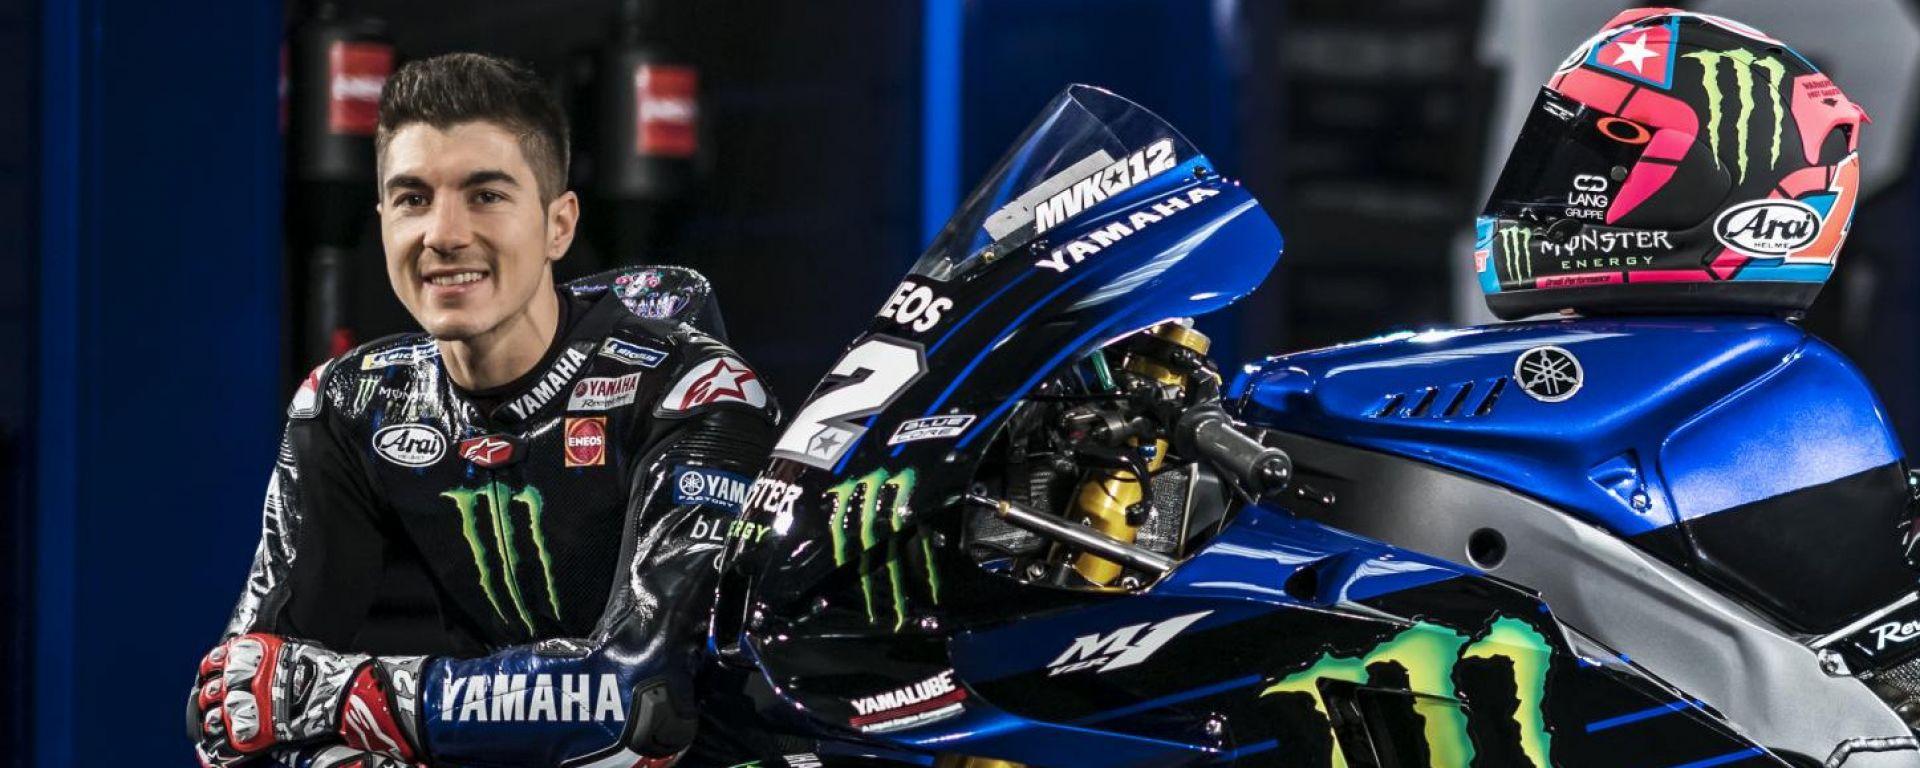 MotoGP 2019, Maverick Vinales - Monster Energy Yamaha Racing